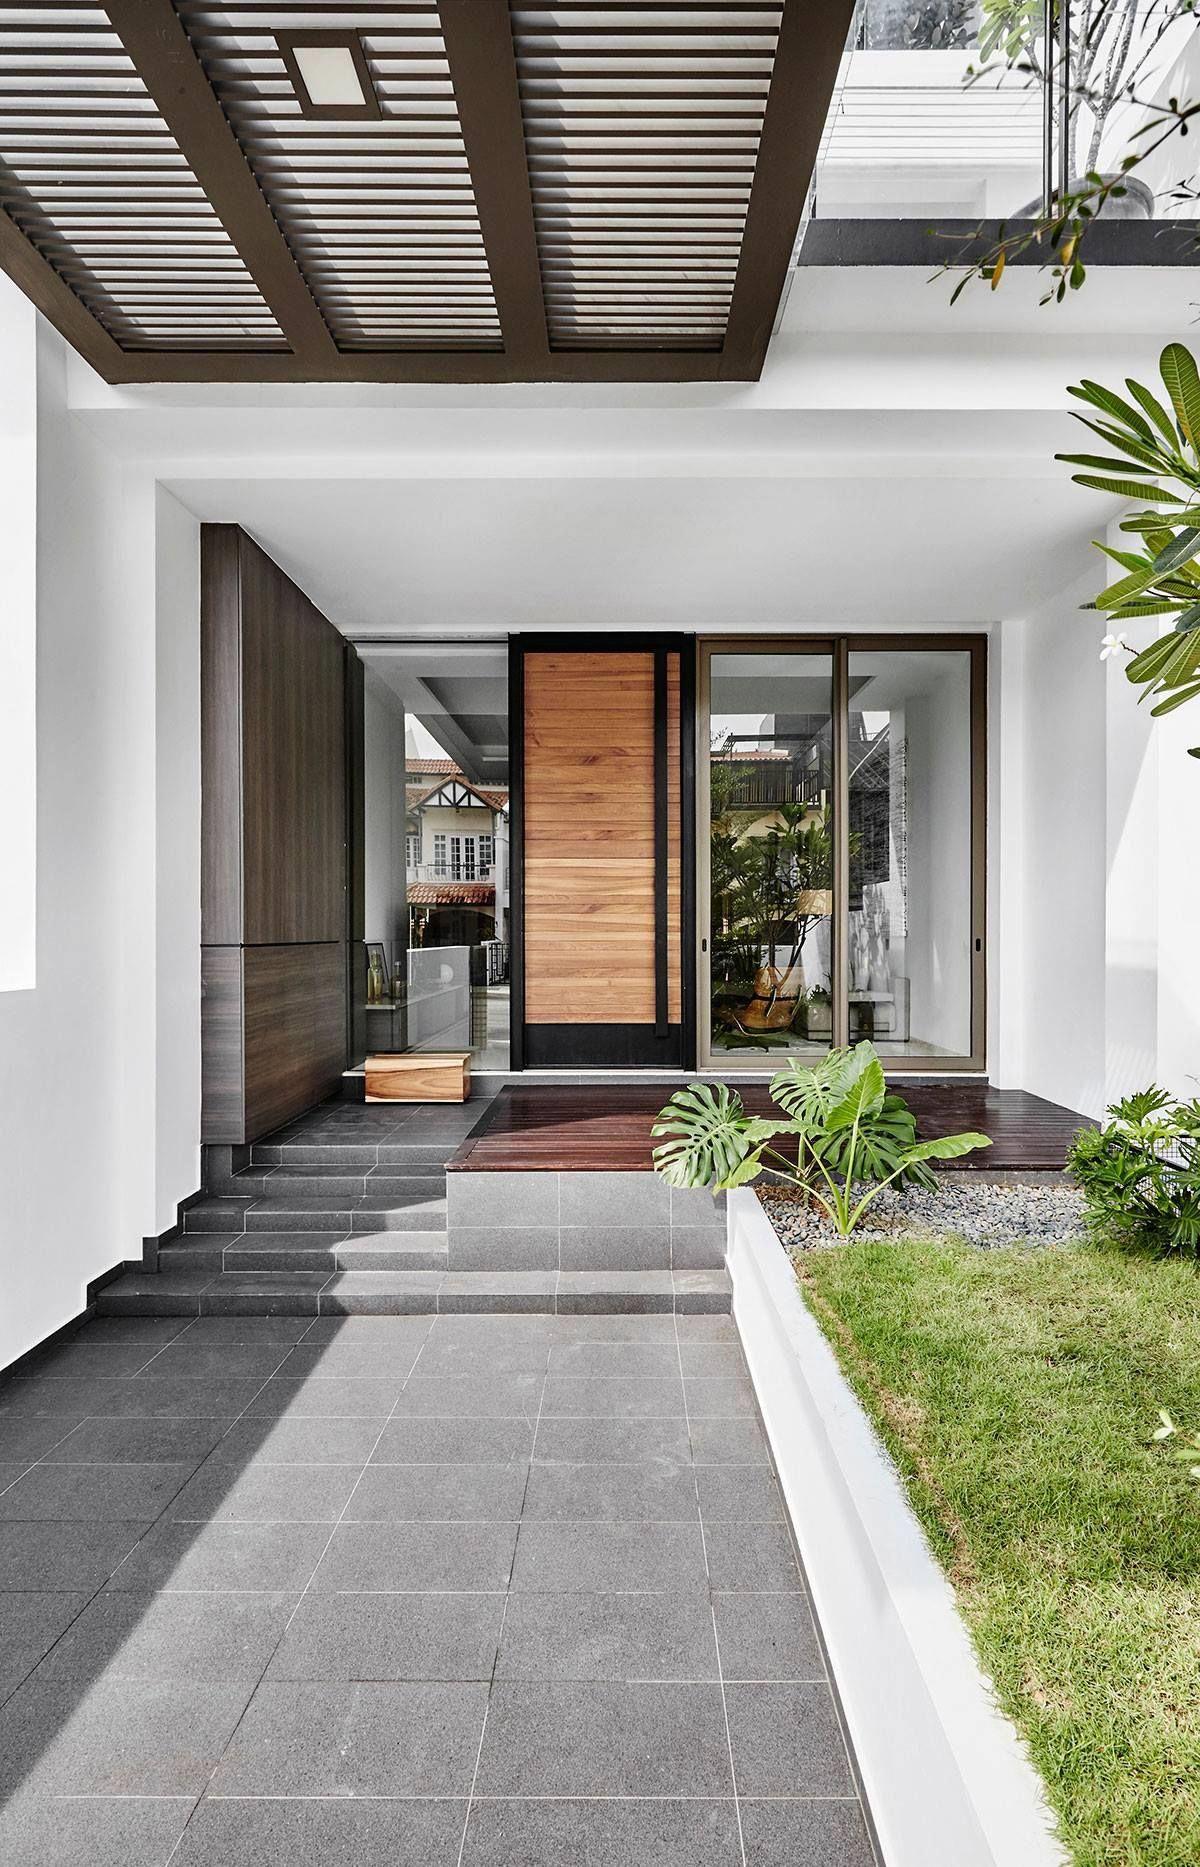 Porch Ideas For Houses Thiết Kế Singapore Cửa đen